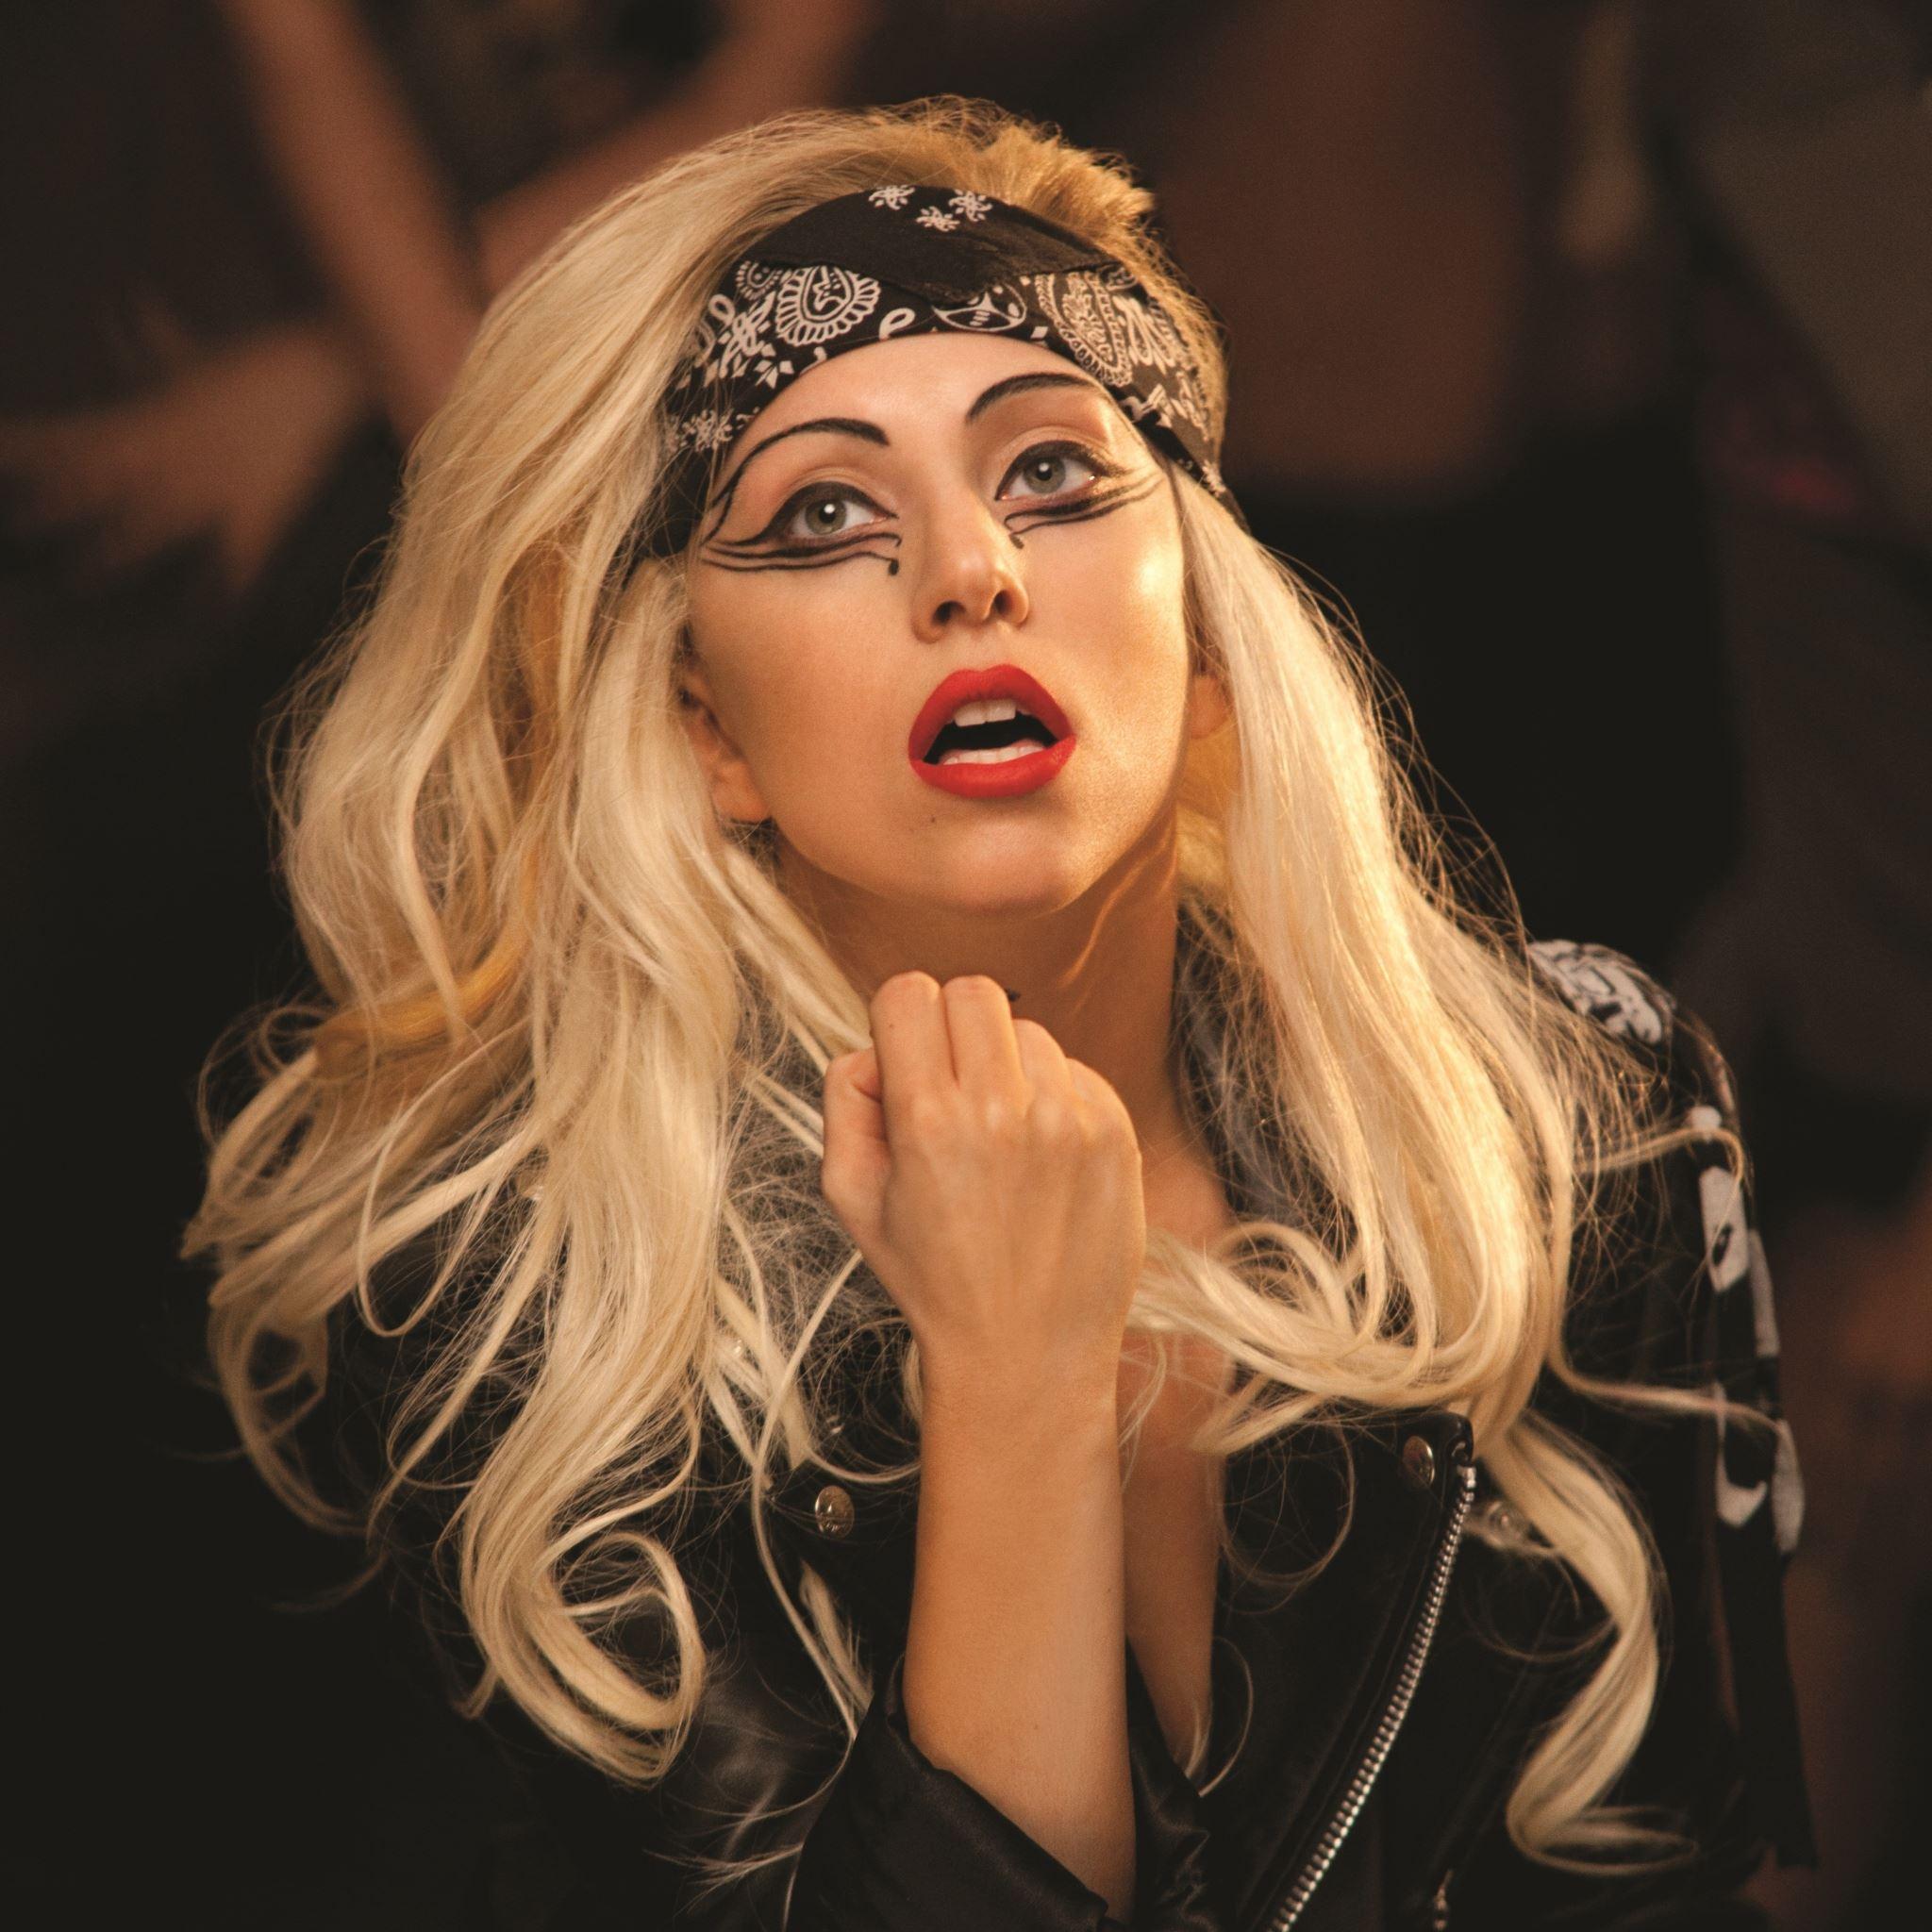 Lady Gaga Mother Monster Singer Makeup iPad Air wallpaper